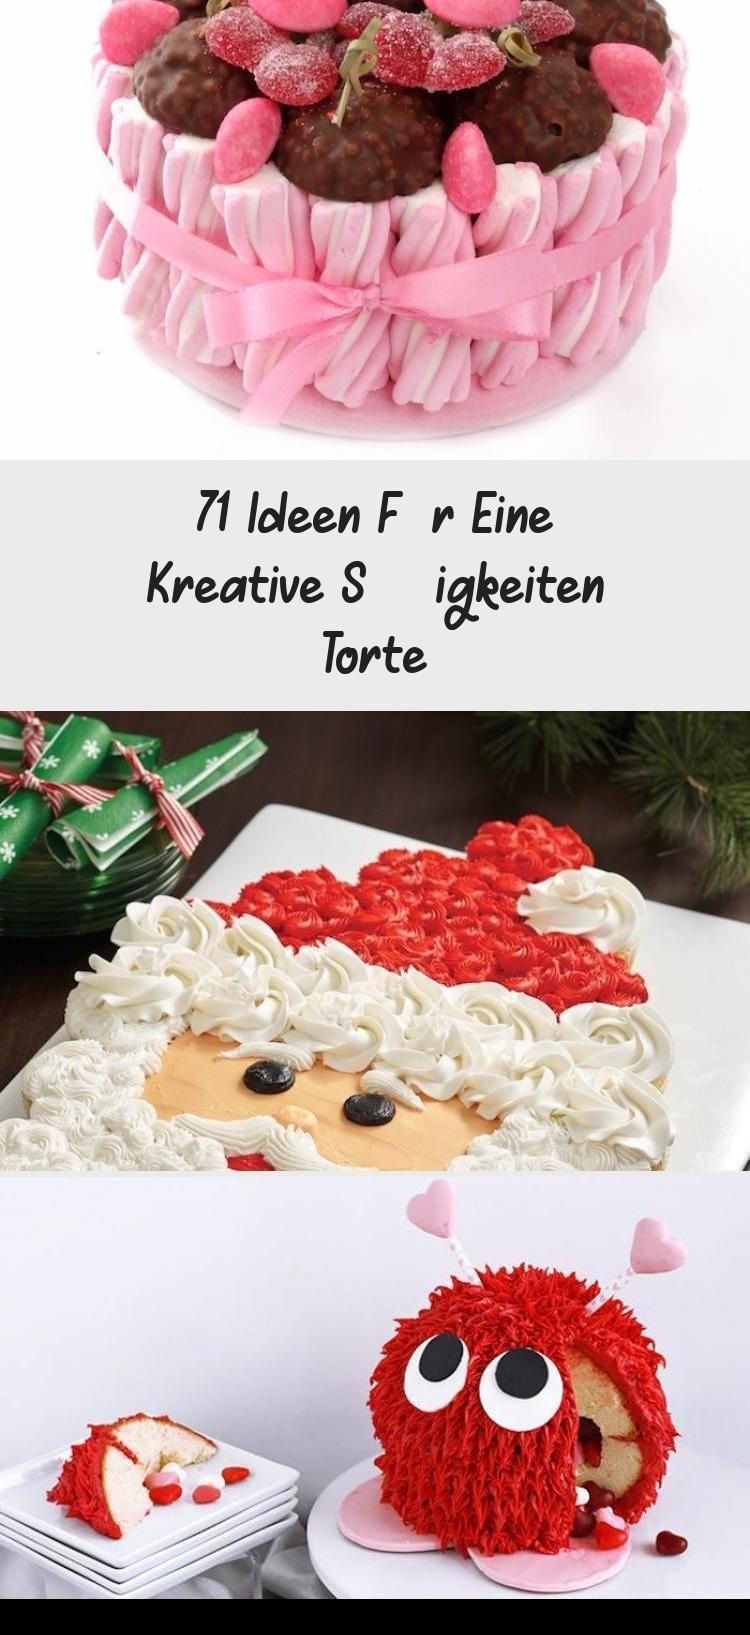 Photo of kinderschokolade torte pinata selber machen, bunten bonbons, schokolade, geleebo…